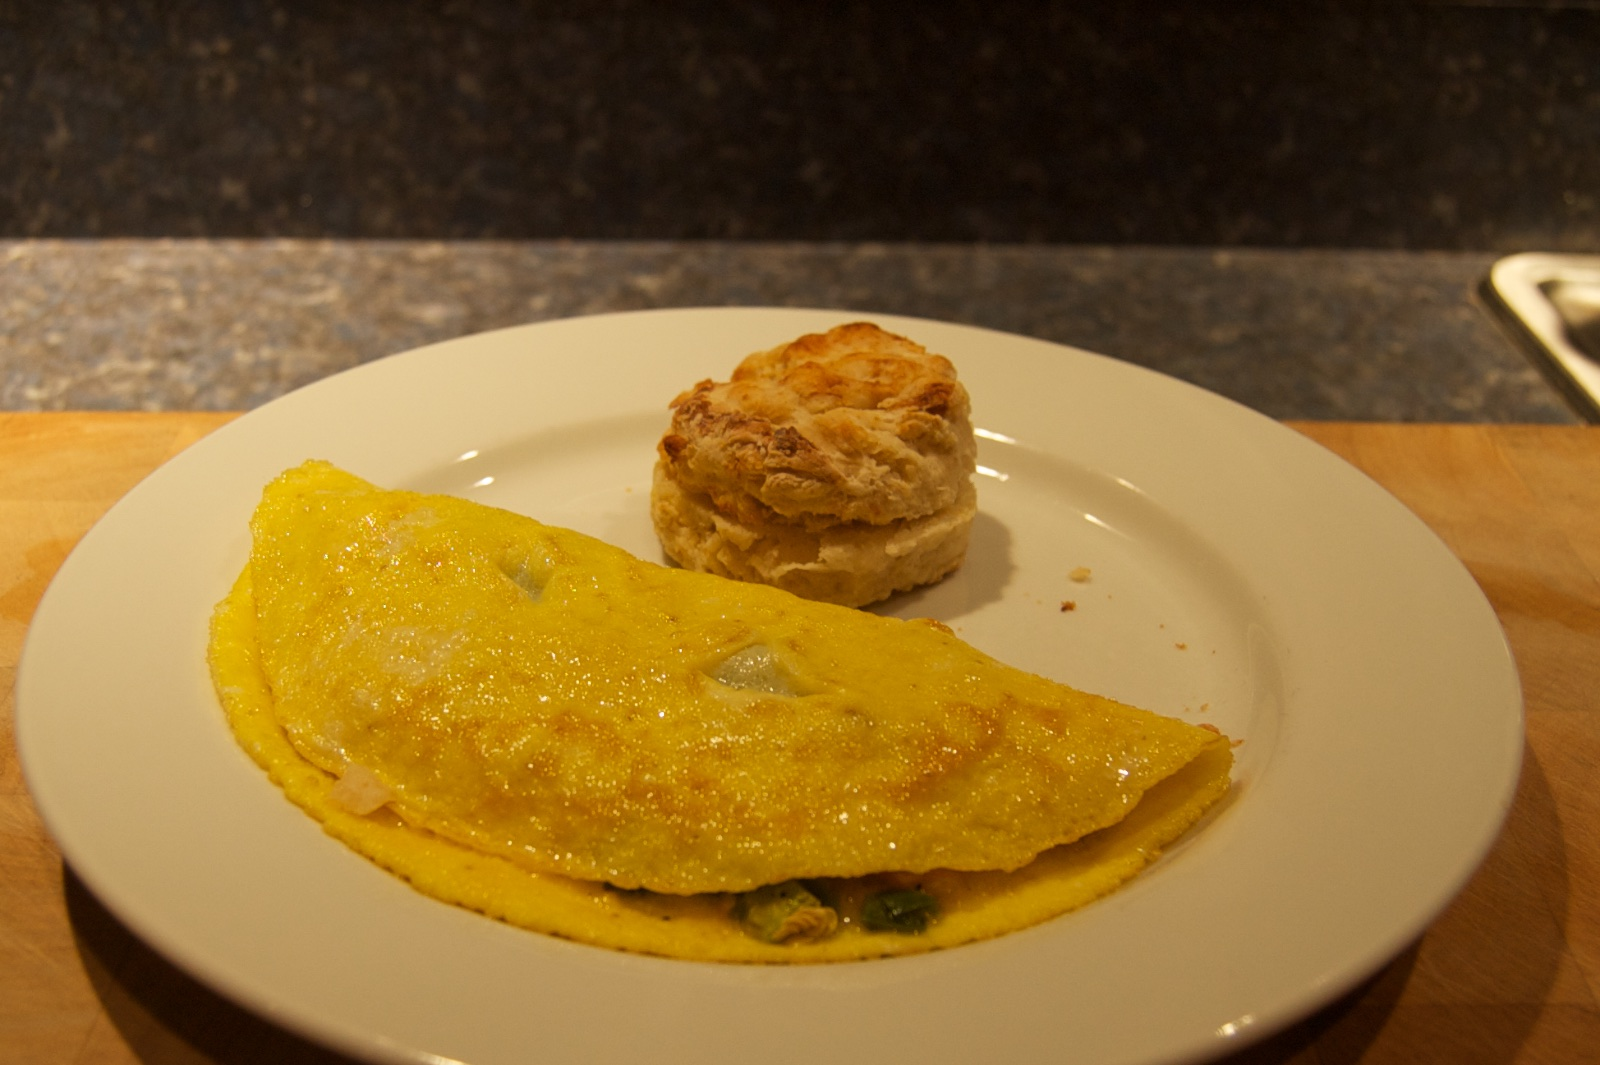 http://blog.rickk.com/food/2015/03/25/ate.2015.03.24.b.jpg